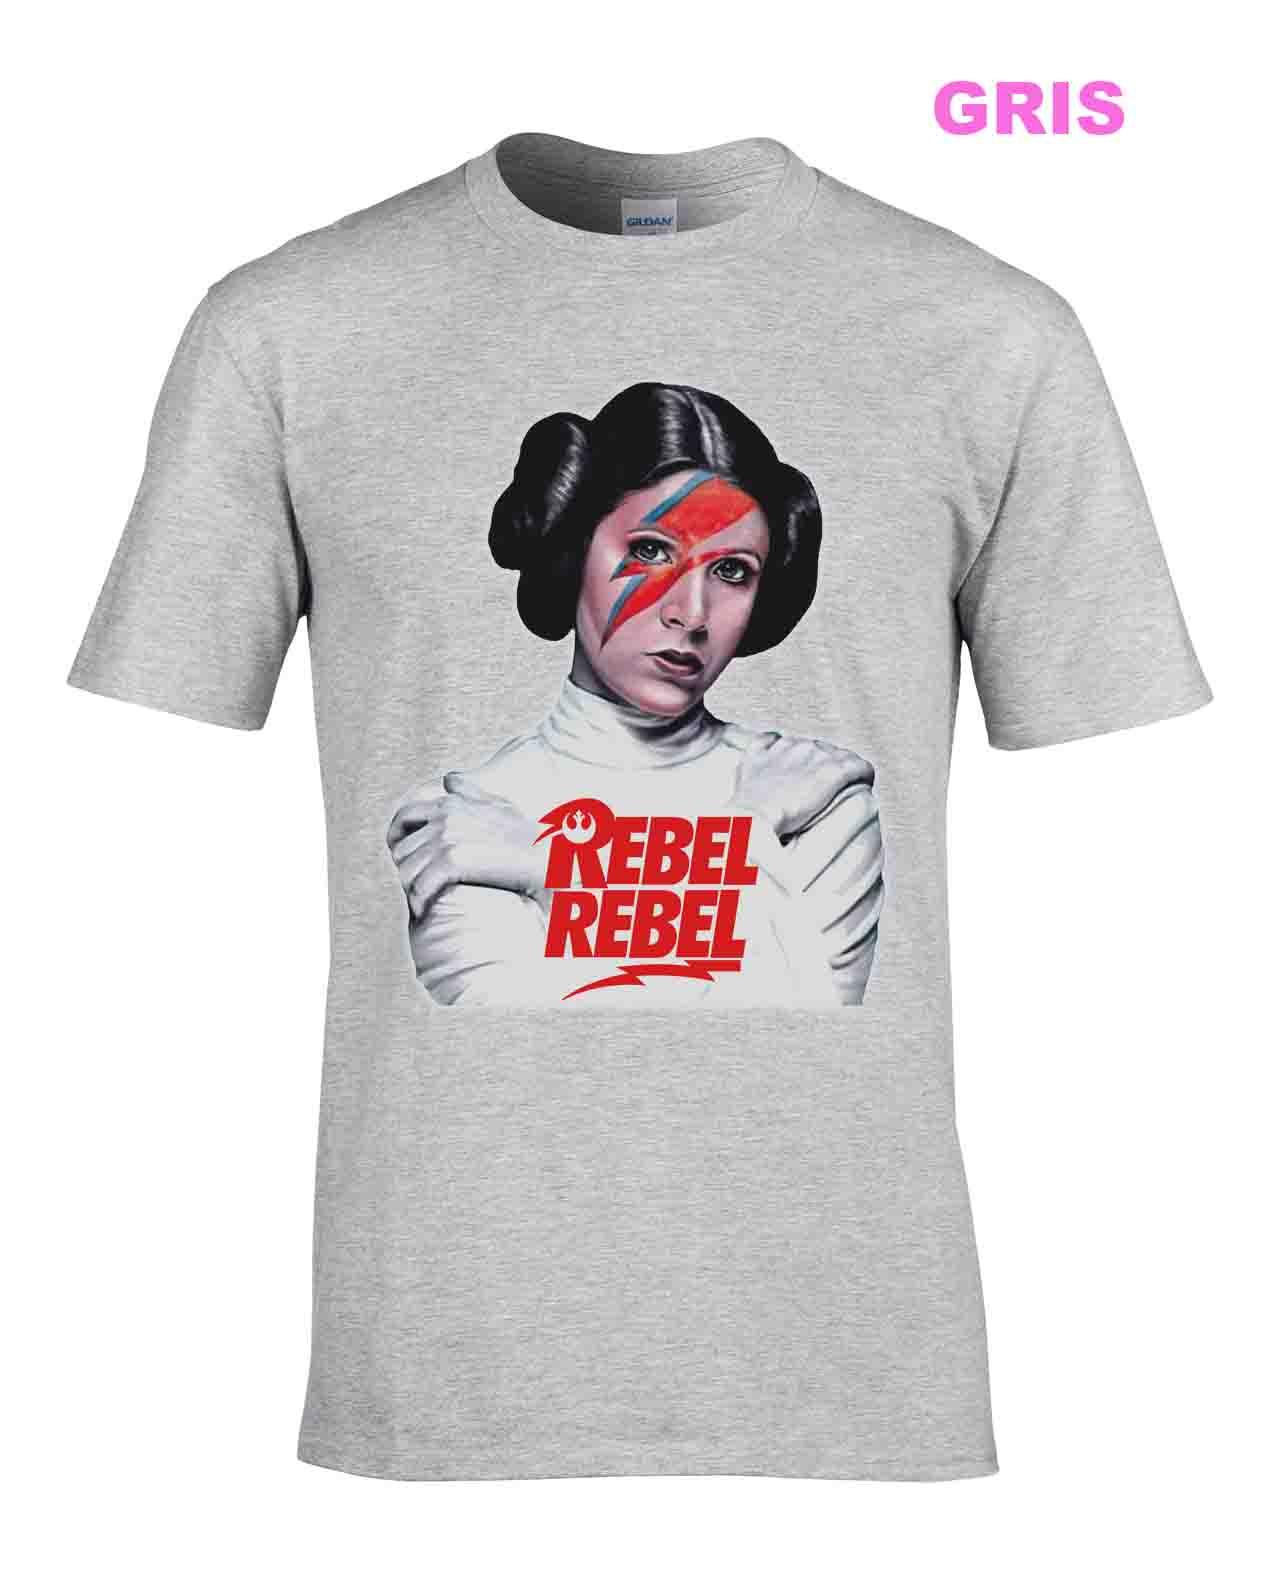 Star Wars - Rebel Rebel